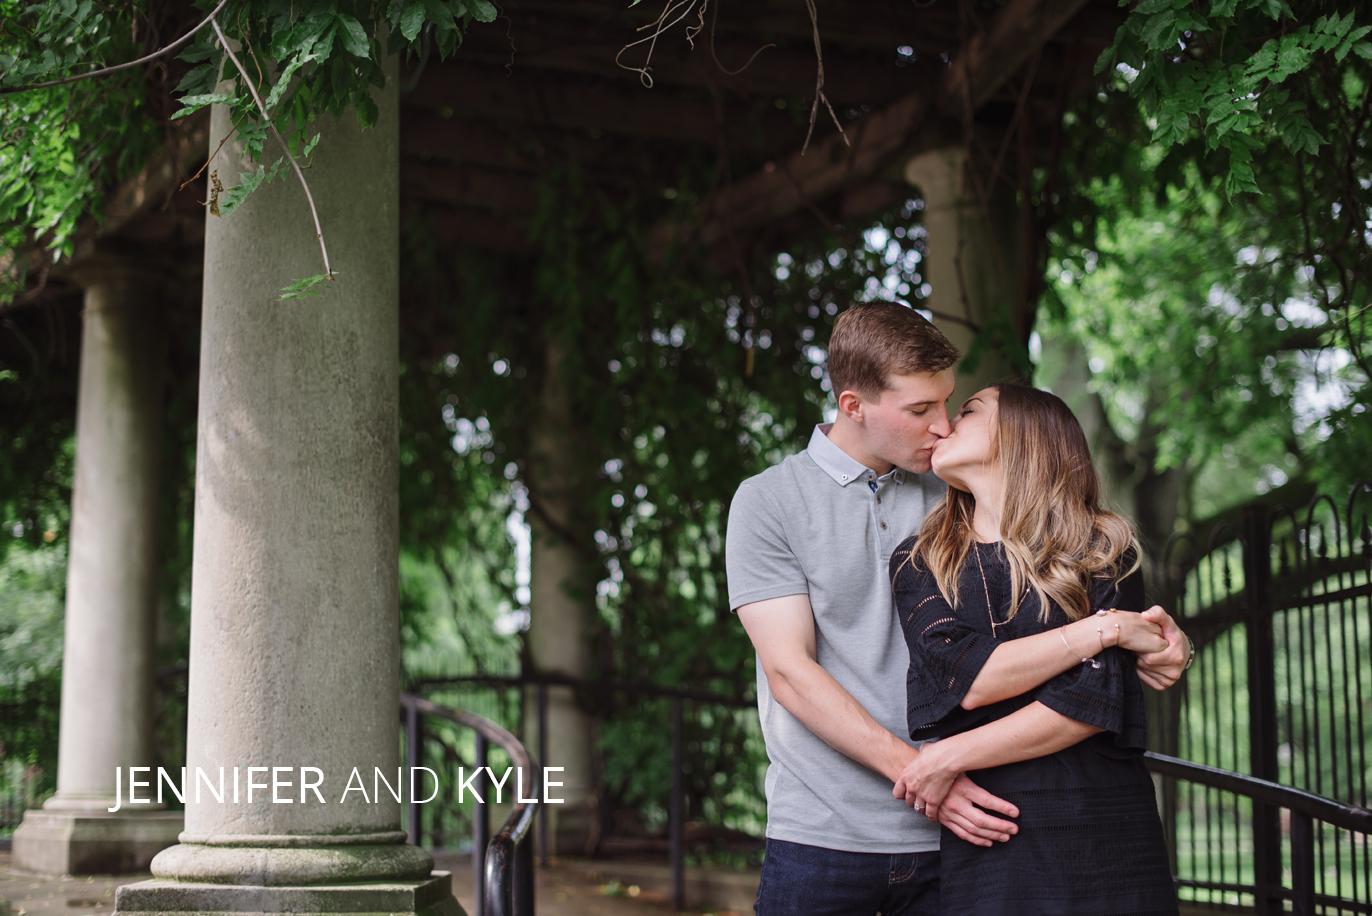 jennifer and kyle kissing in schiller park